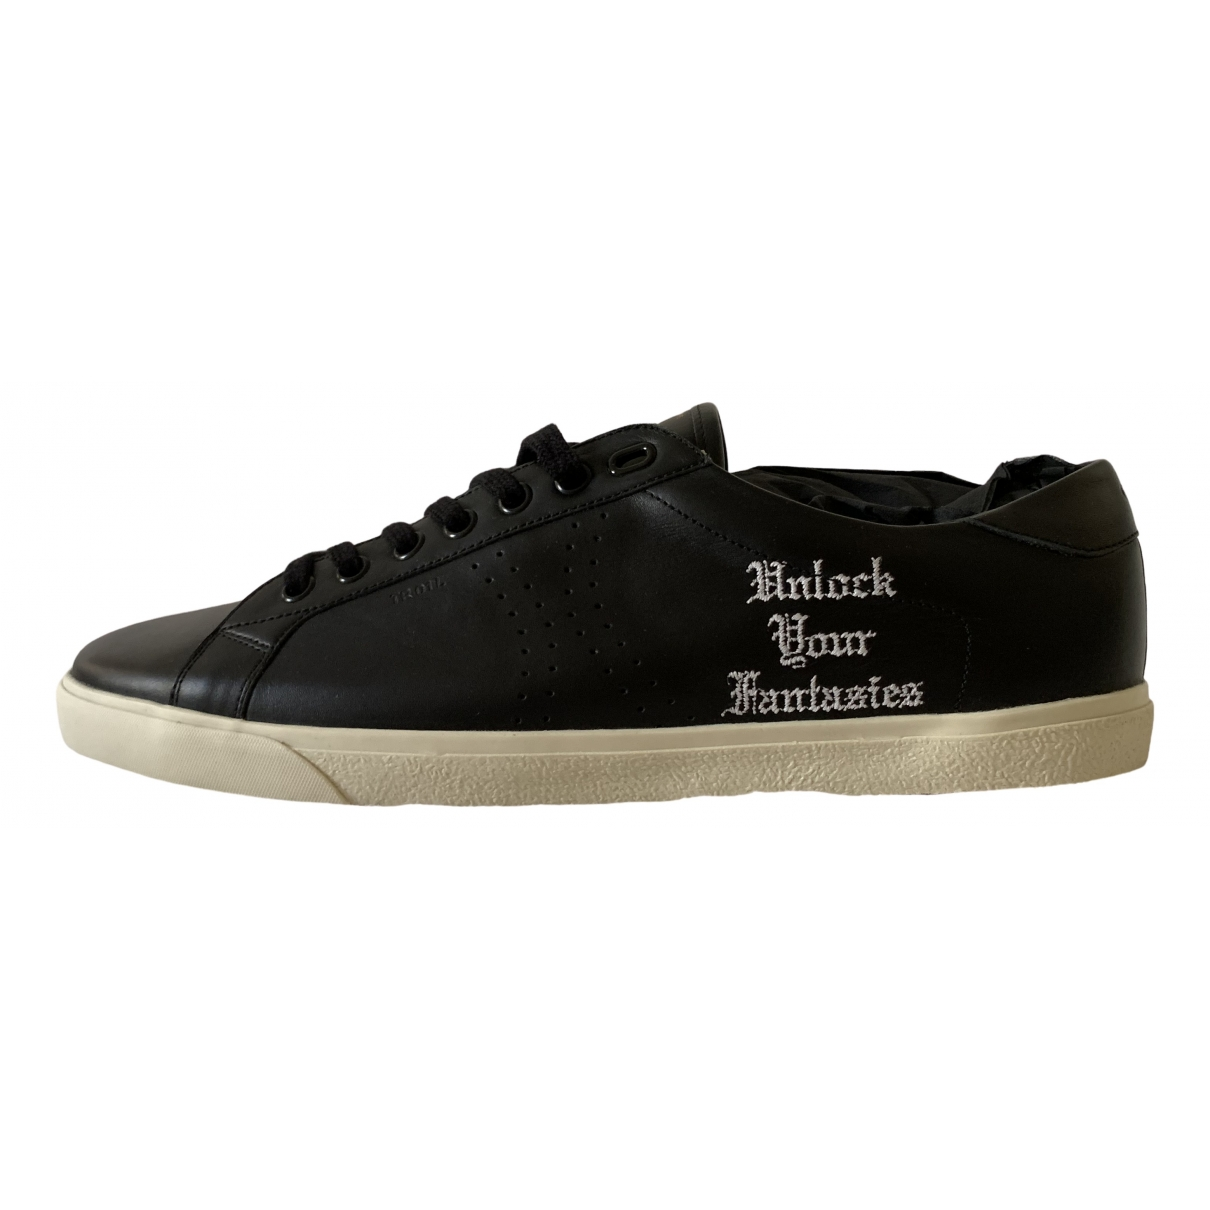 Celine Triomphe Sneakers in  Schwarz Leder